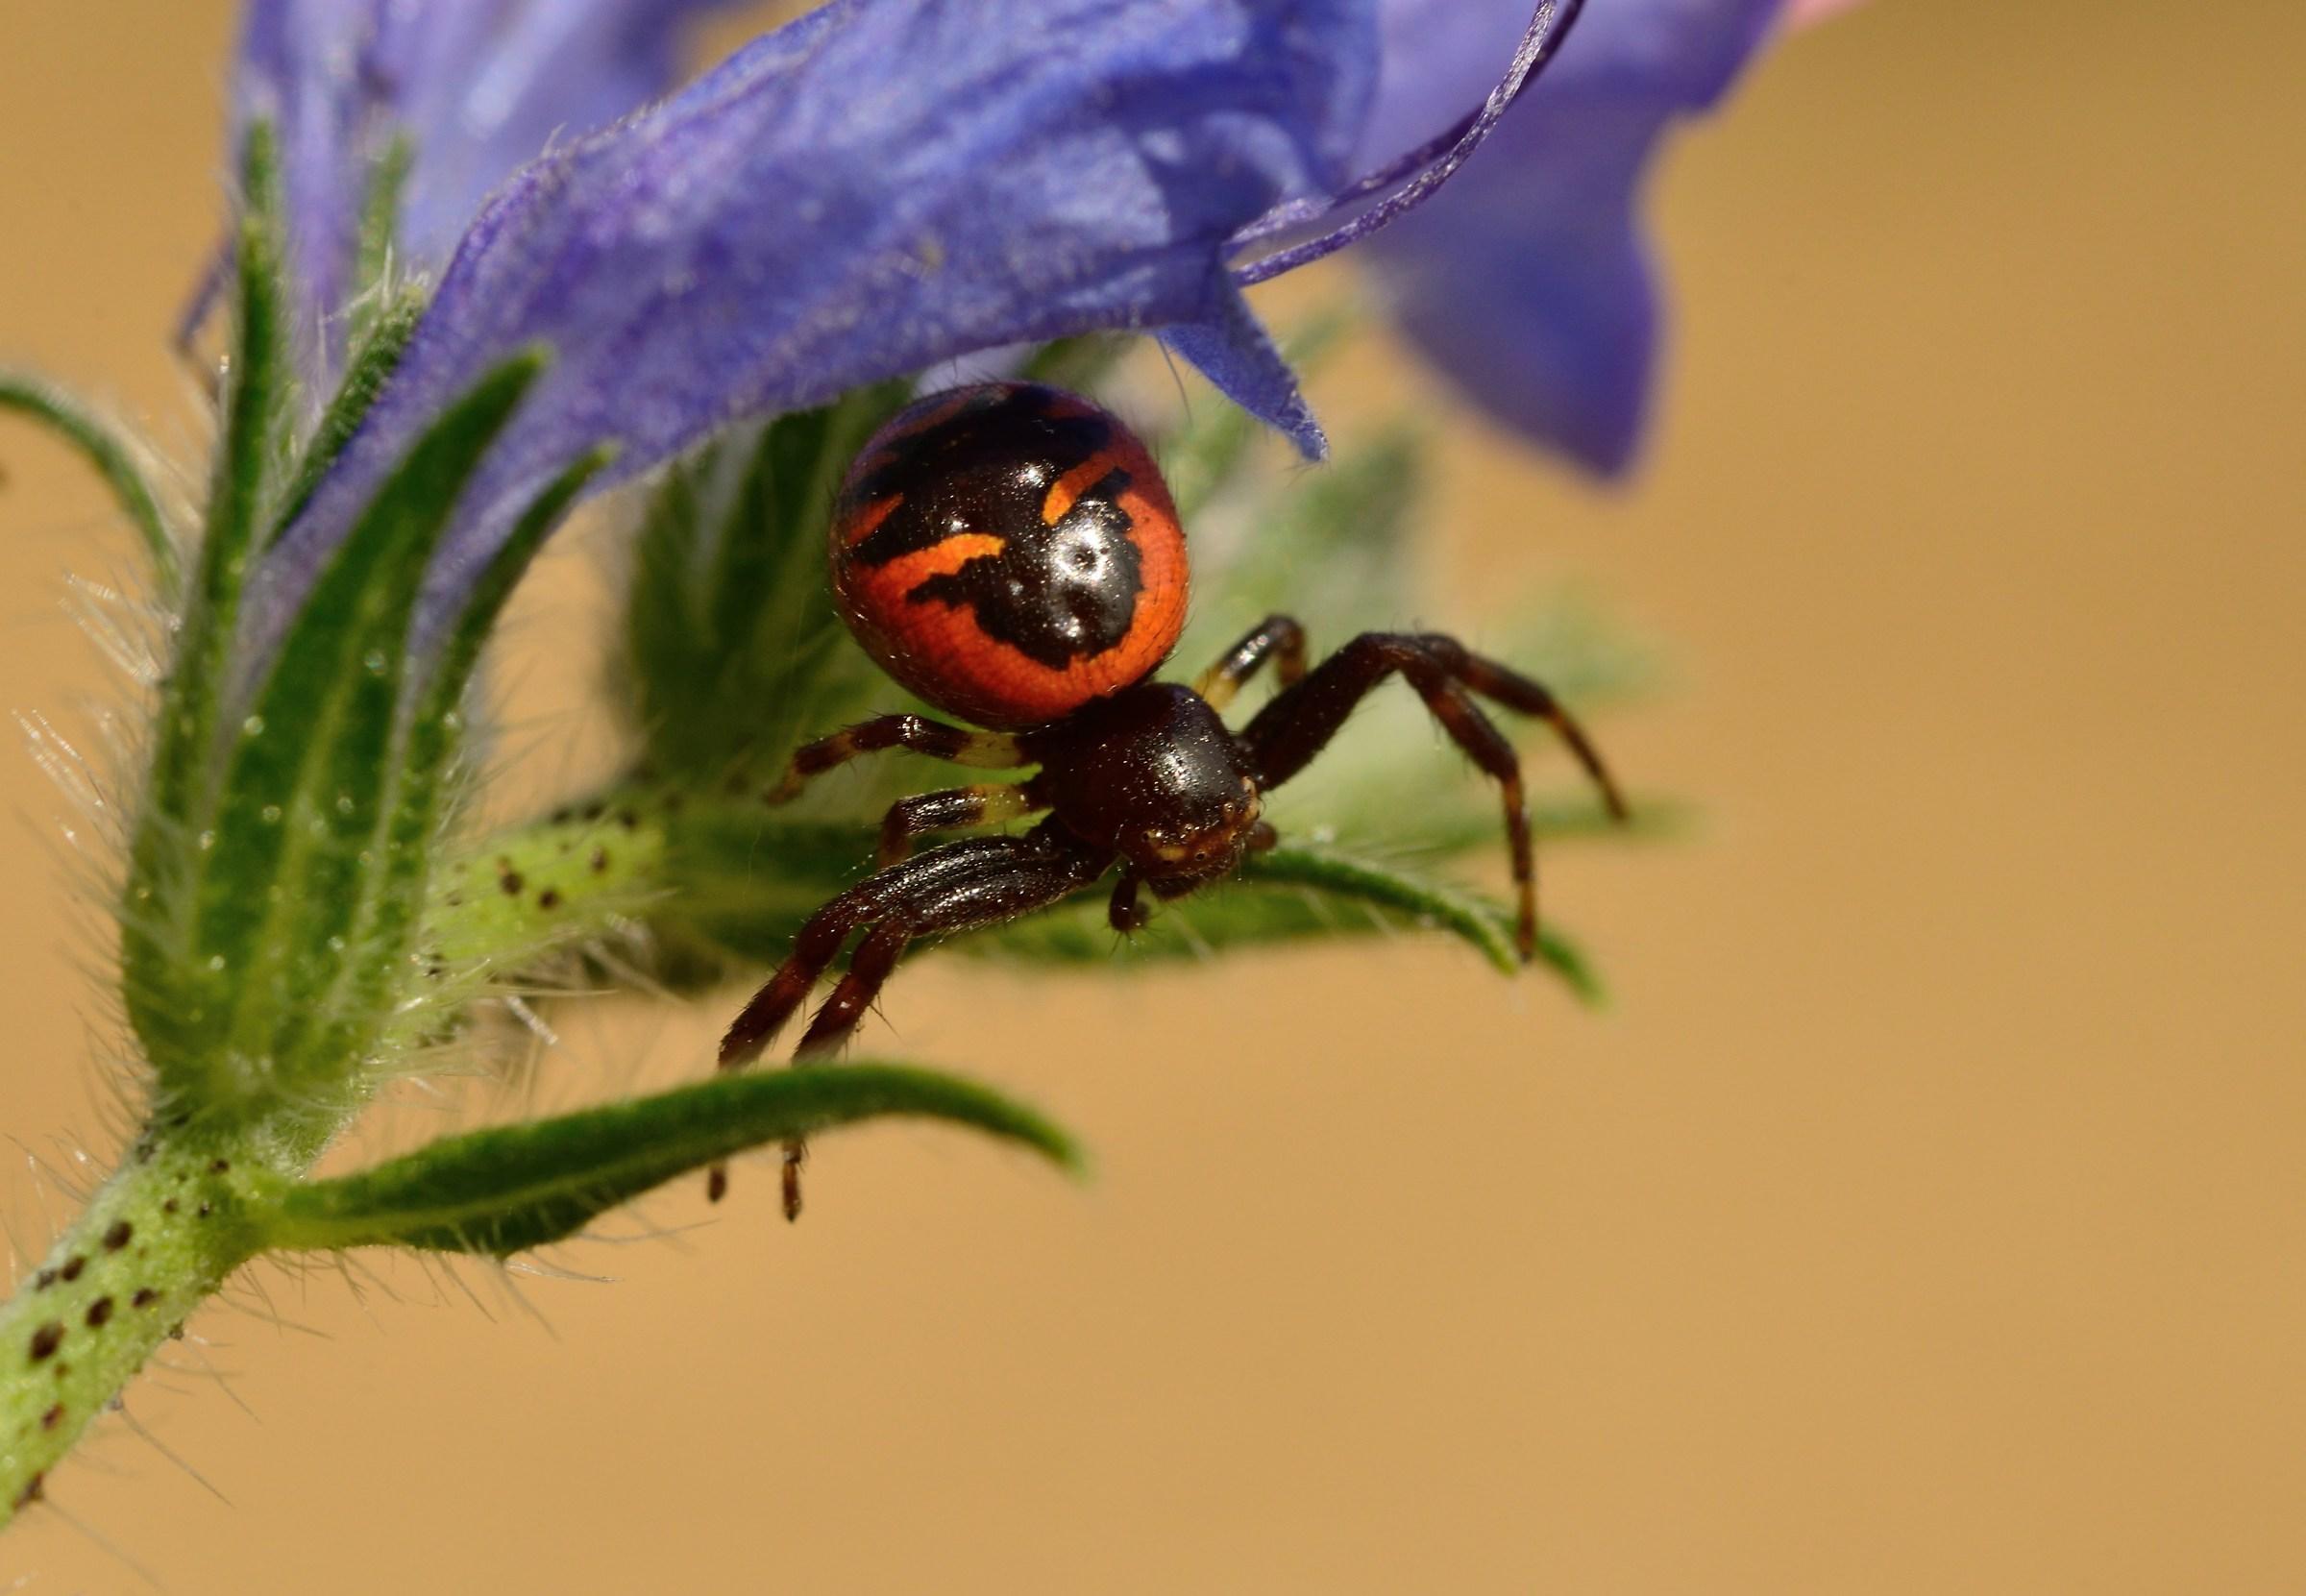 Spider ready x attack...